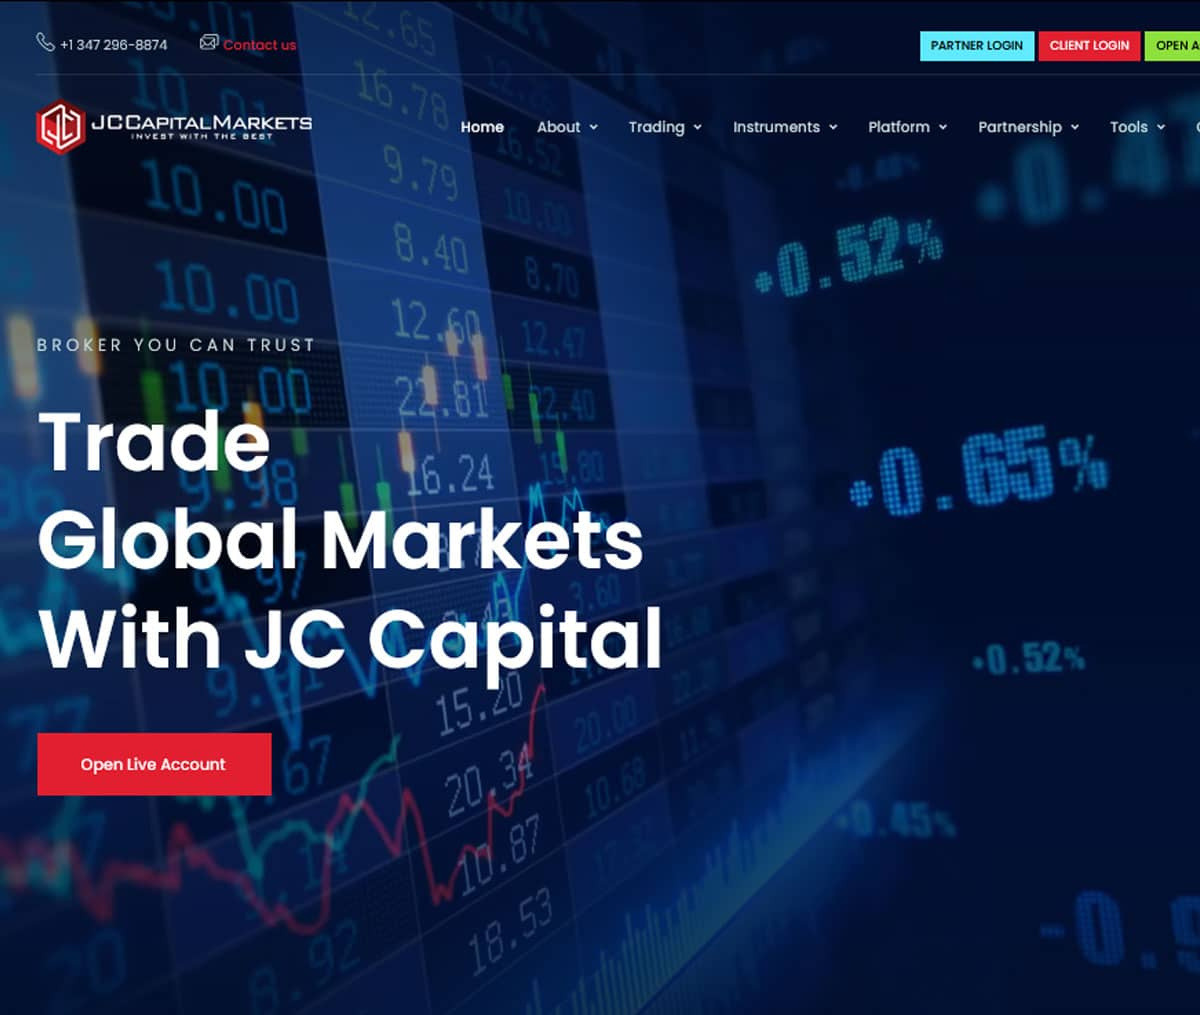 Página web de JC Capital Markets